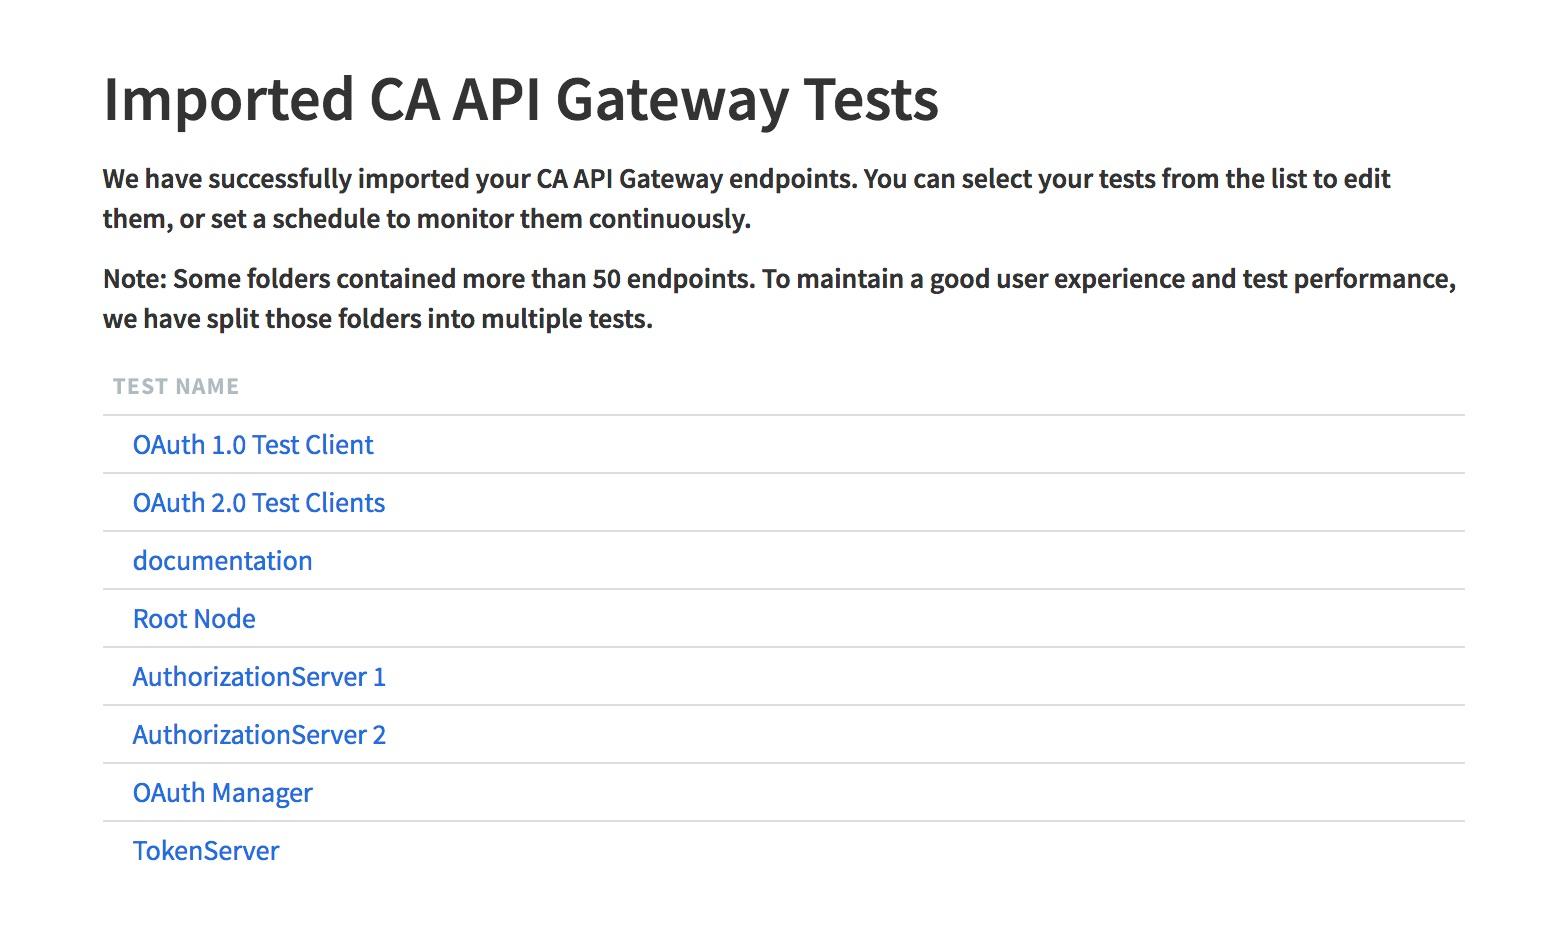 10-runscope-api-gateway-import-success.jpg